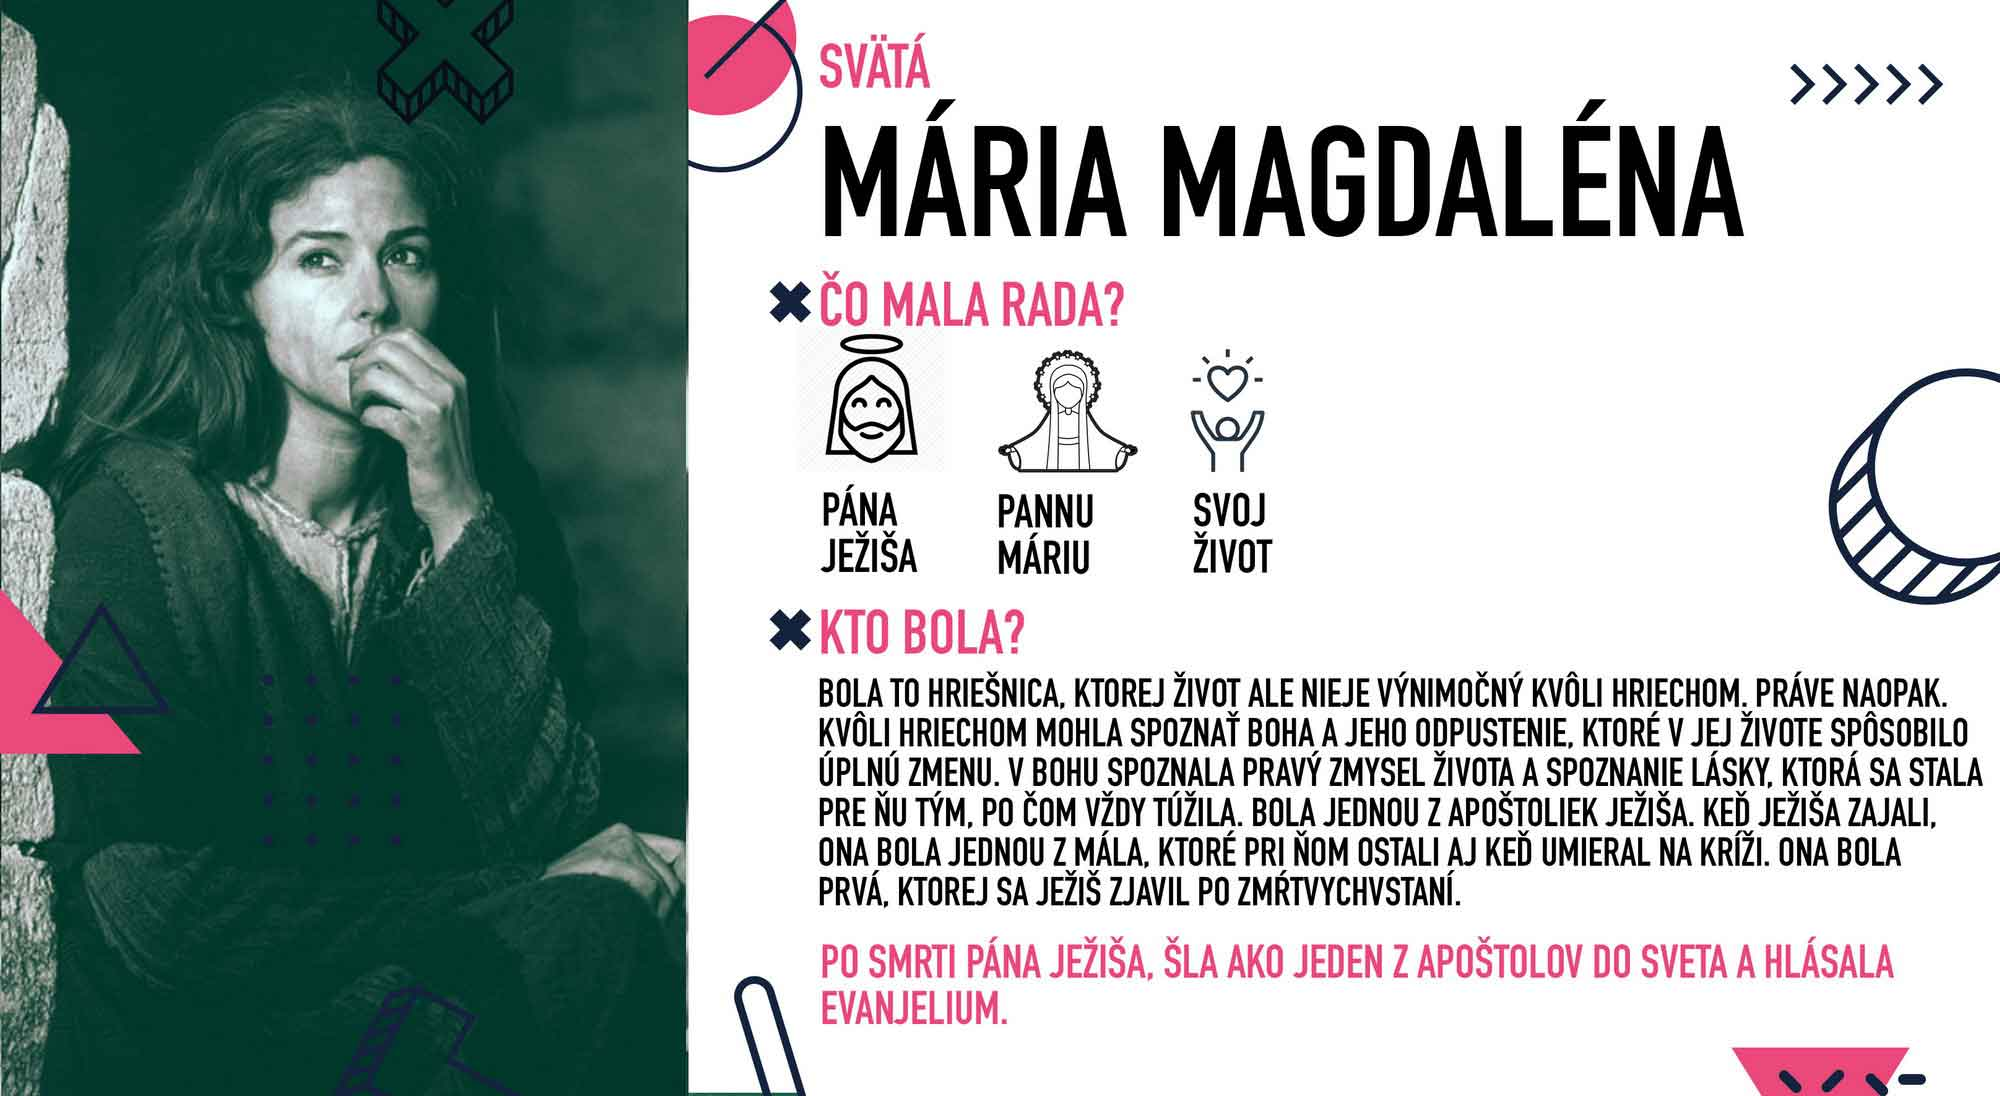 Mária-Magdaléna